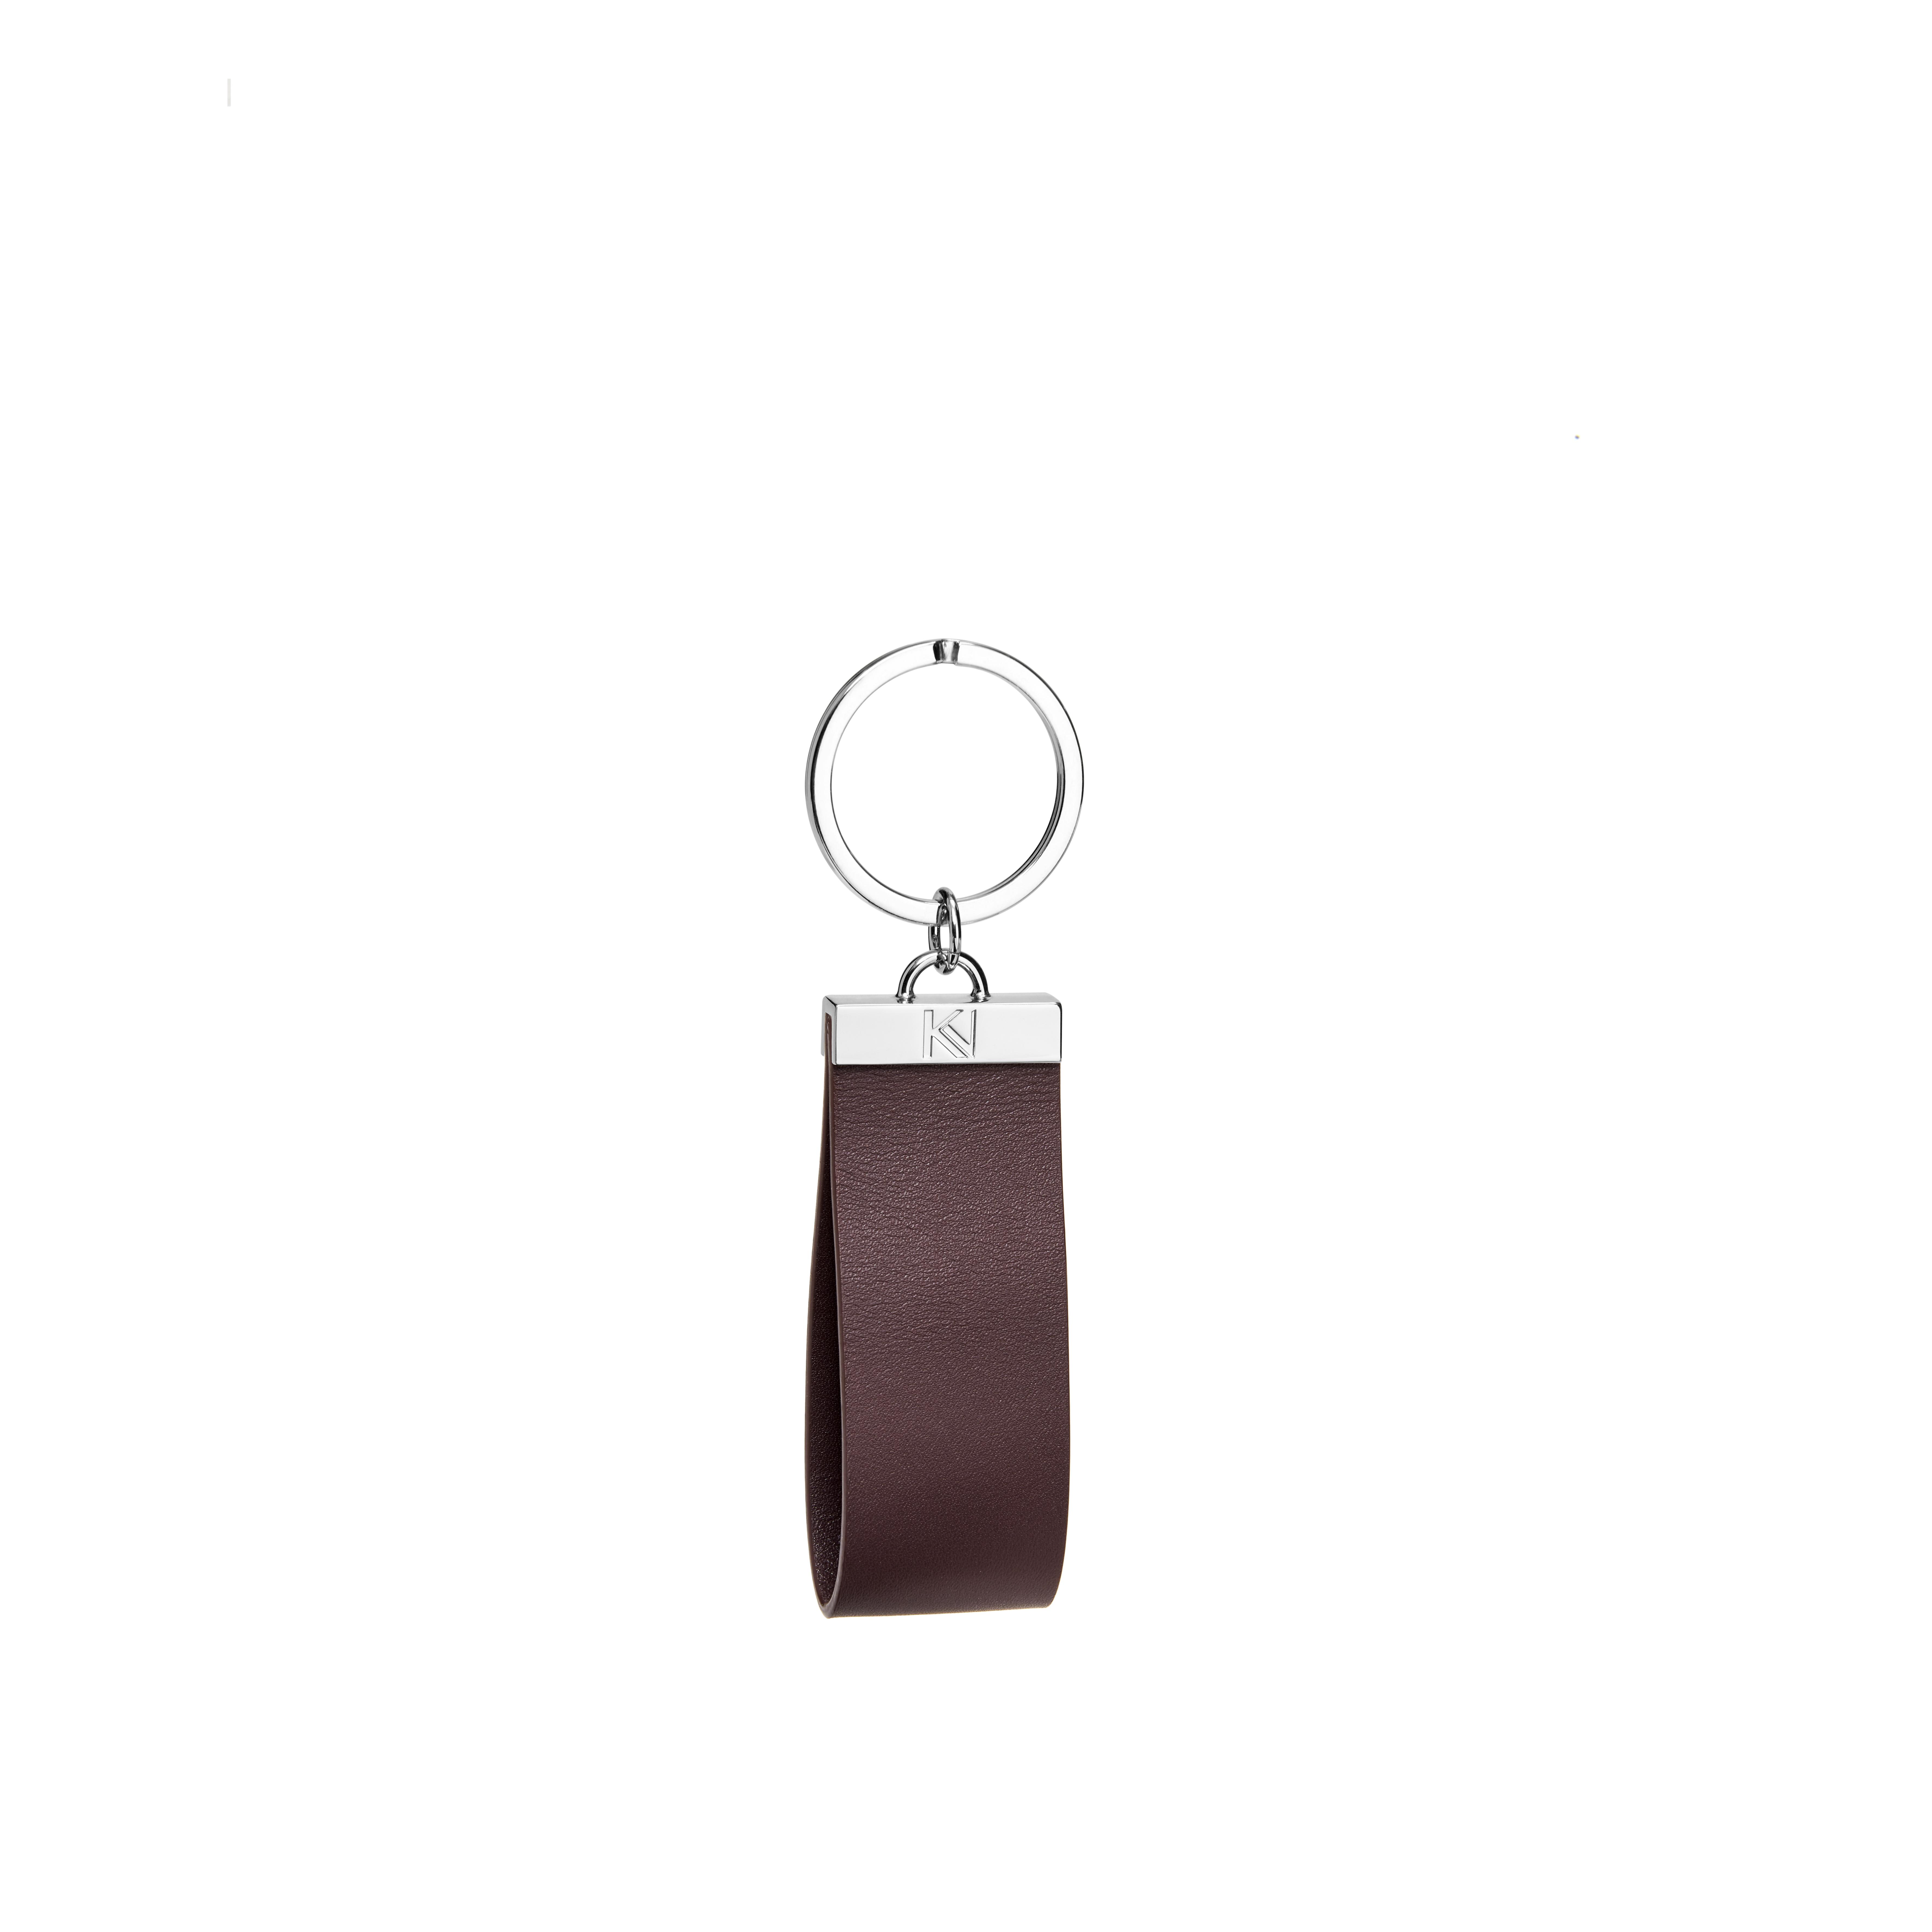 porte-clés-cuir-lisse-aubergine-nickel-ingénieux-karenvogt-1